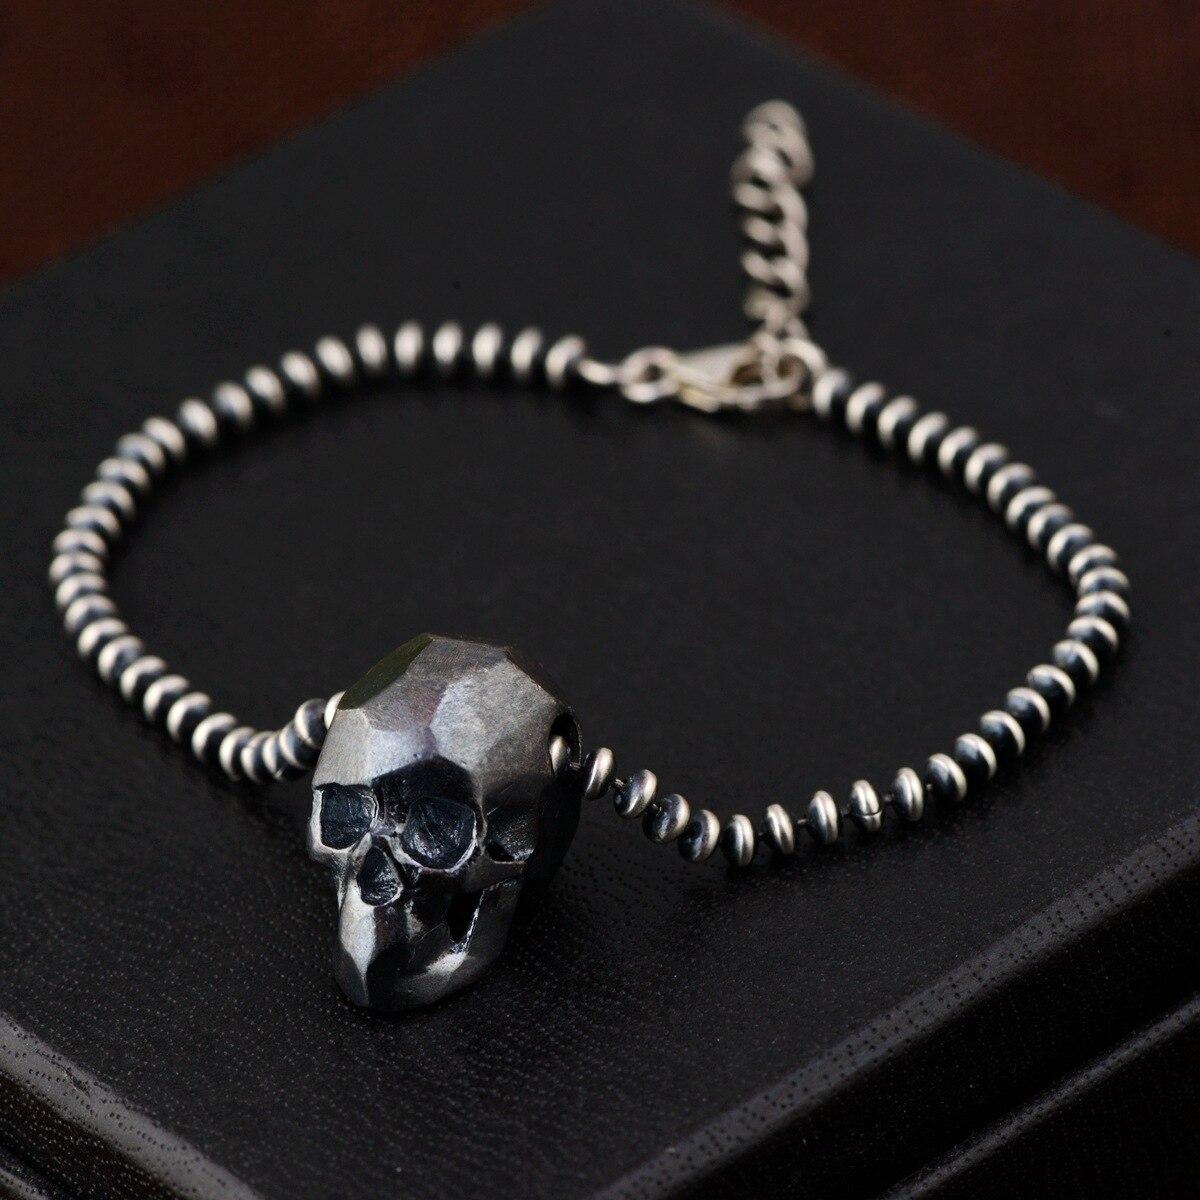 Bracelets & Bangles 925 Sterling Silver Skeleton Skull Head Beads Chain Bracelets For Men Women Thai Silver Vintage Punk Rock